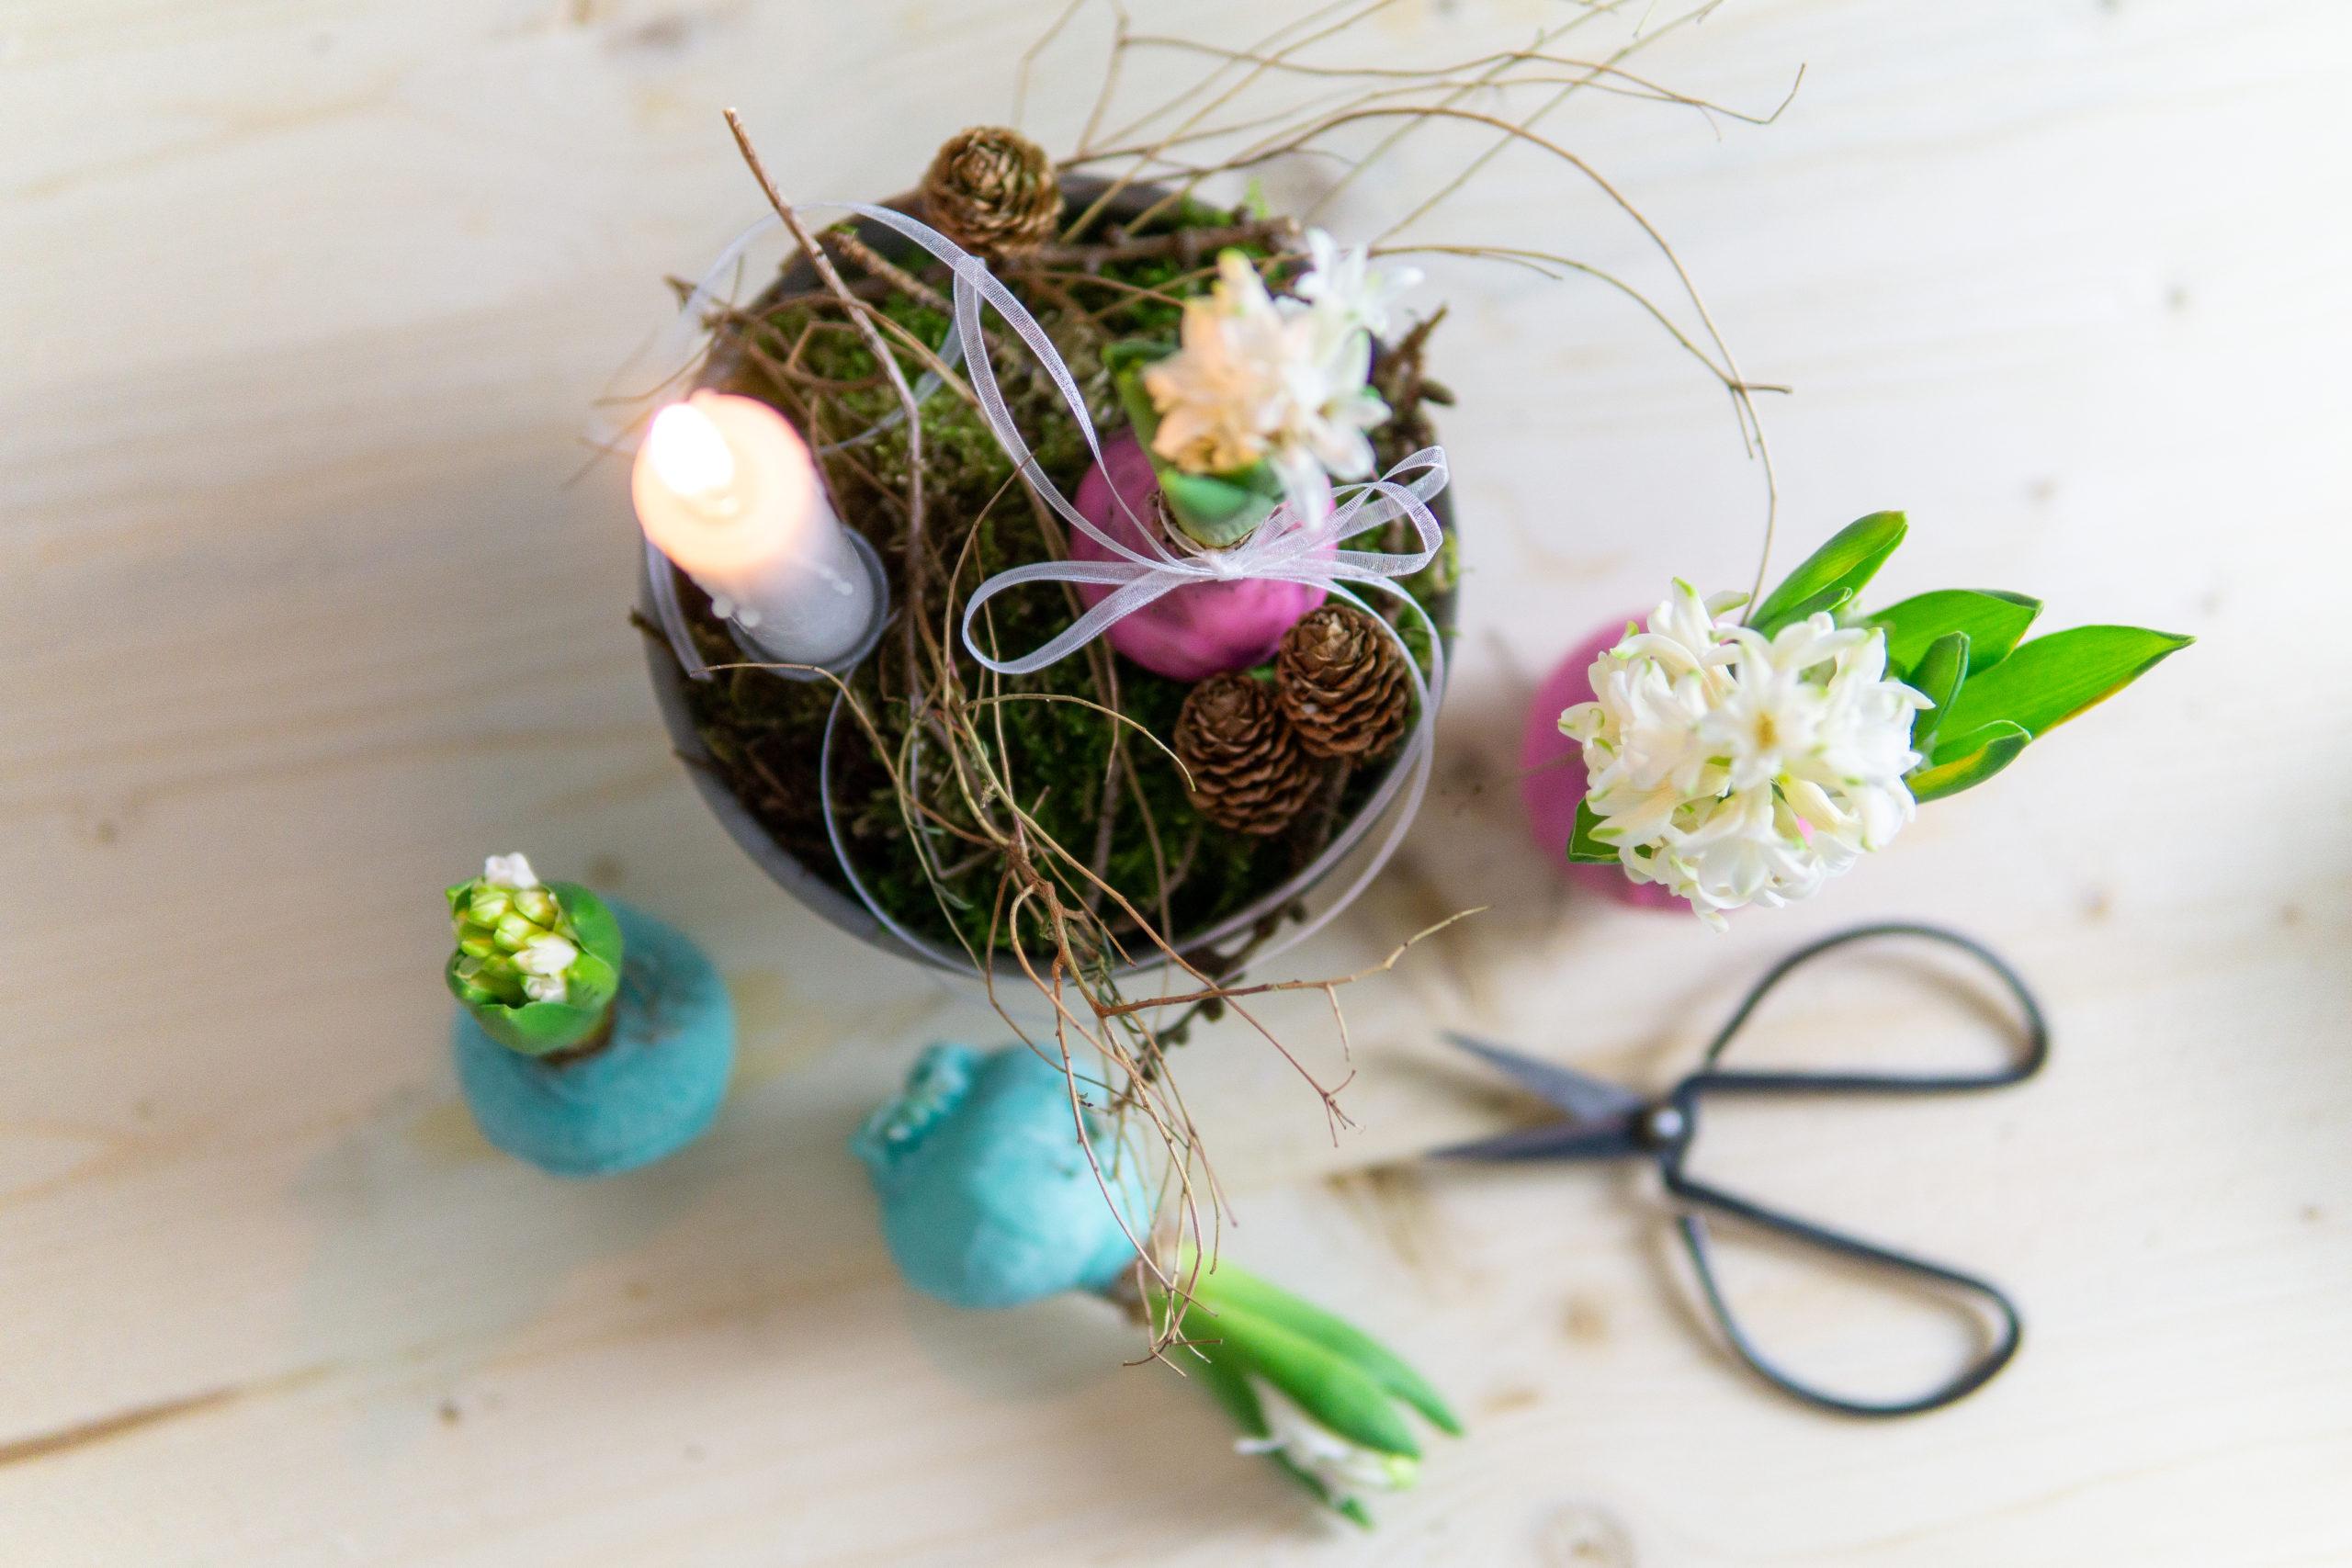 DIY Winterdeko: Hyazinthe im Wachs